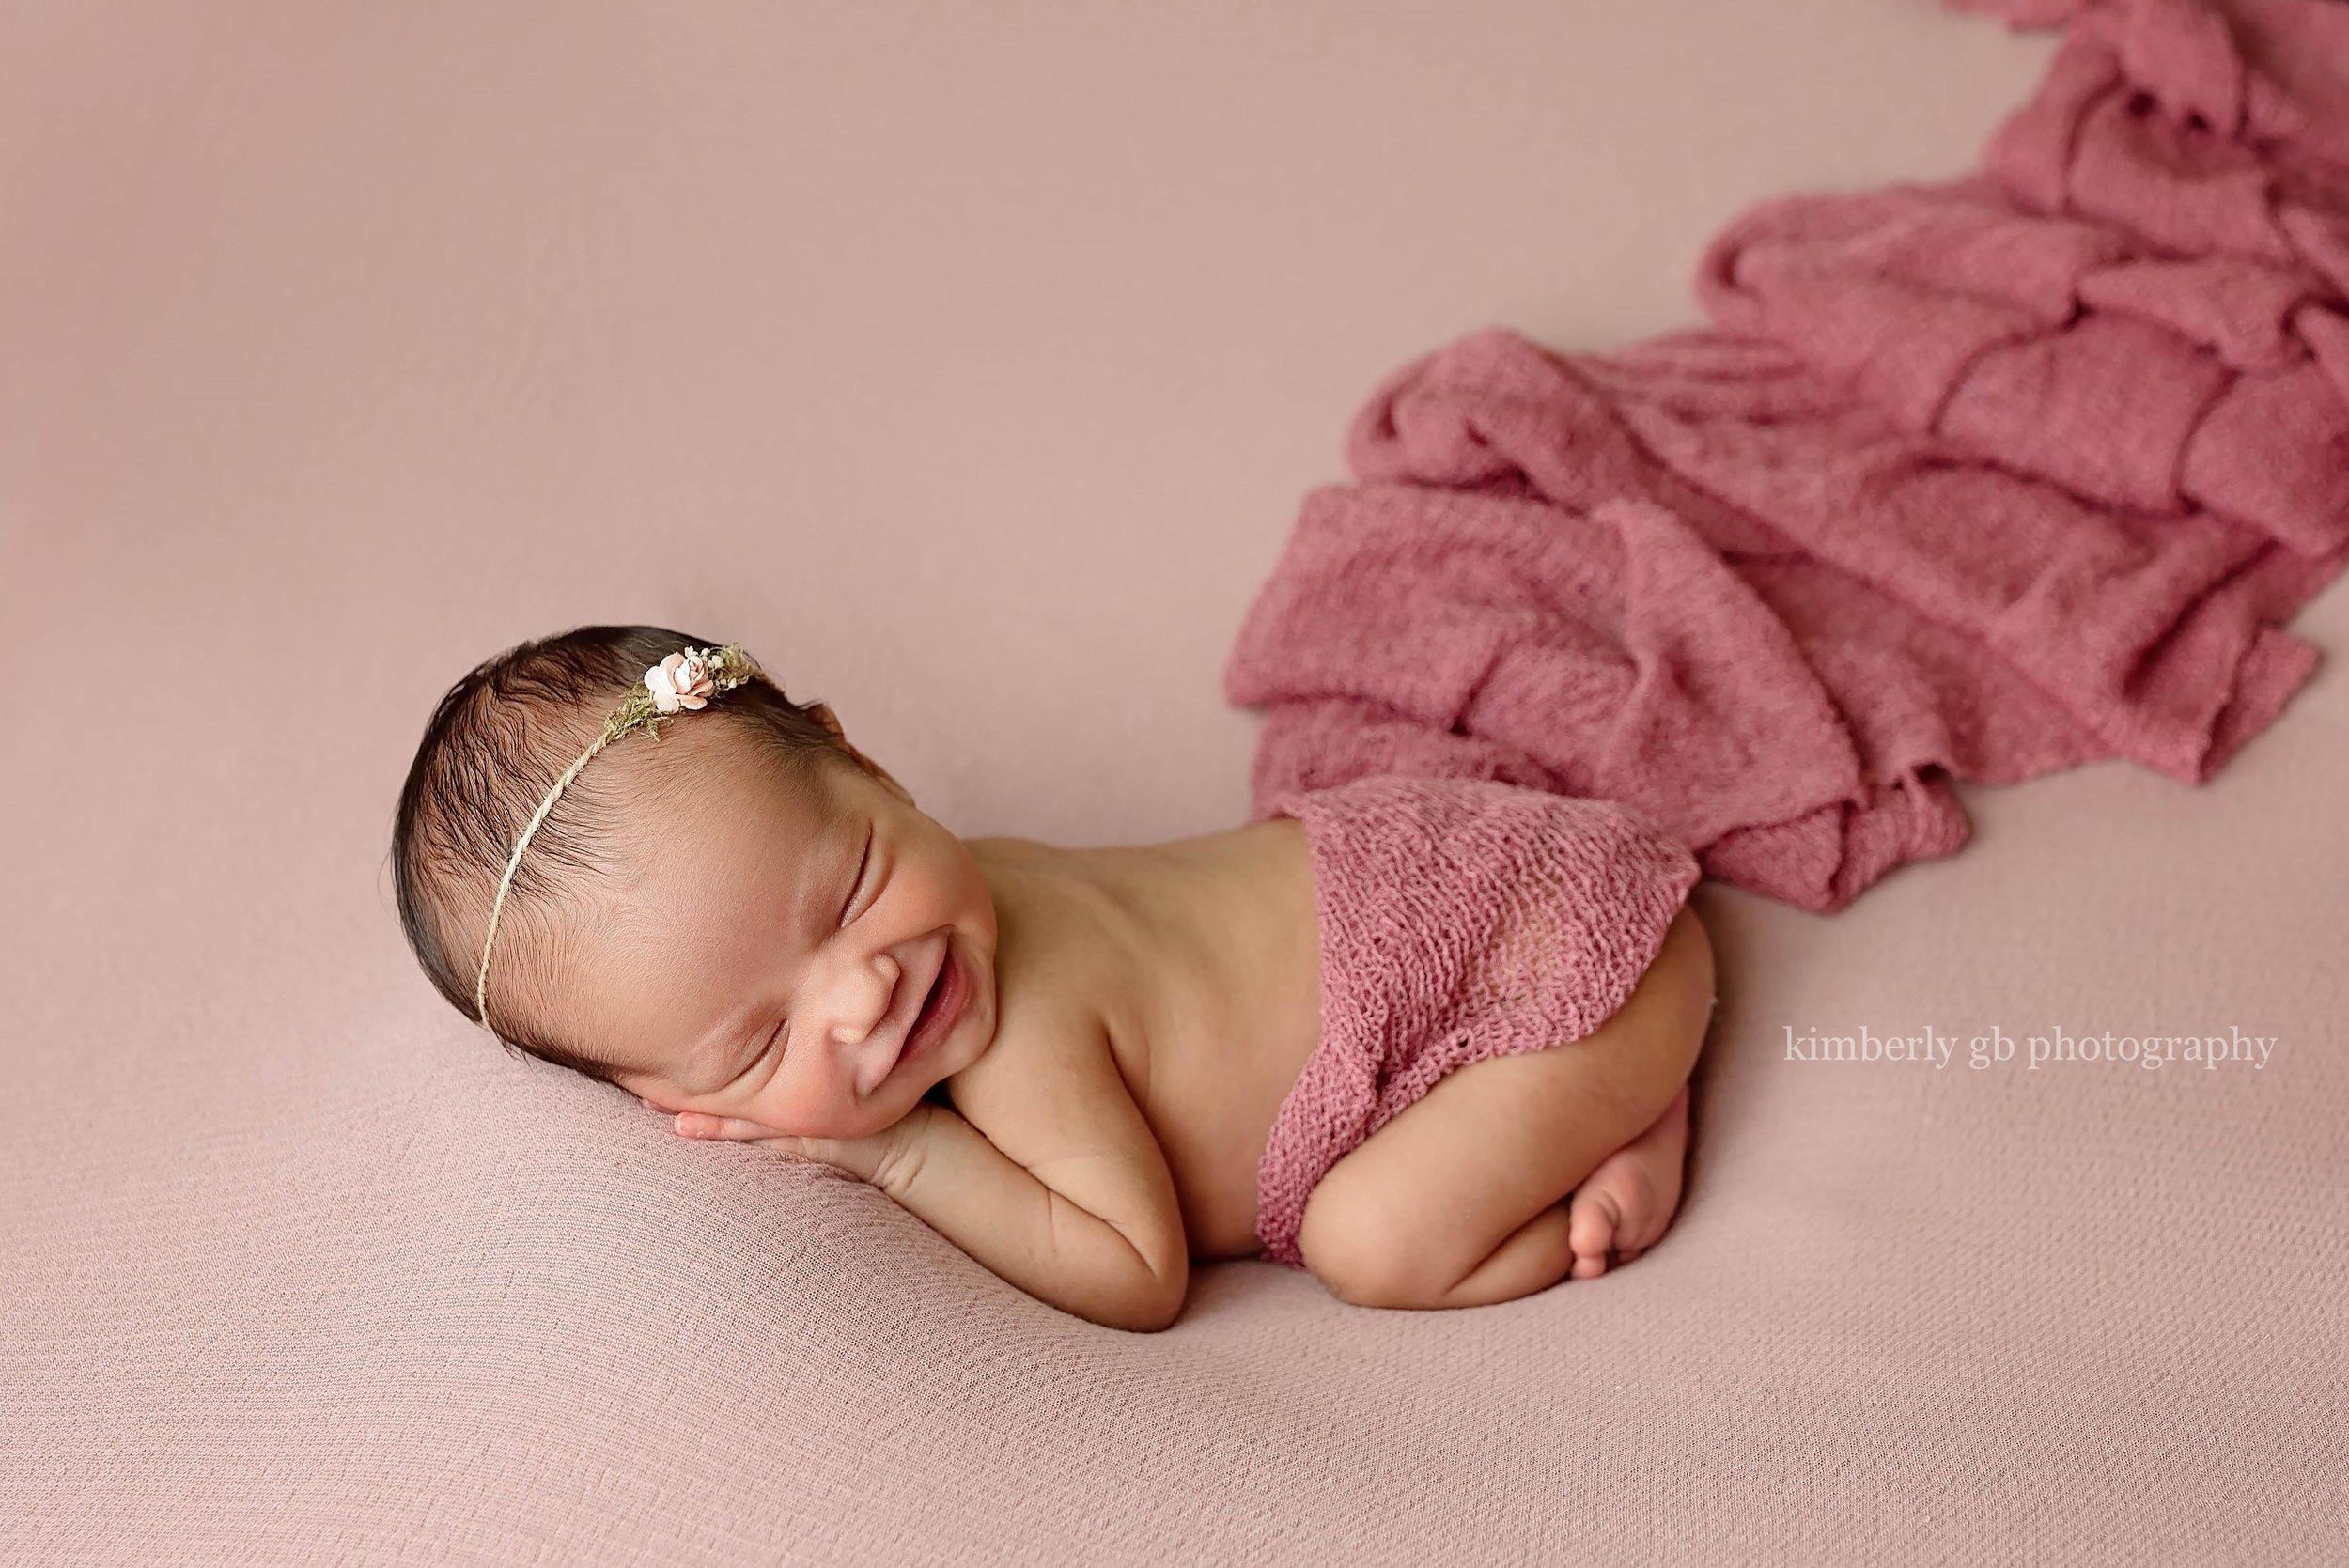 fotografia-de-recien-nacidos-bebes-newborn-en-puerto-rico-kimberly-gb-photography-fotografa-373.jpg